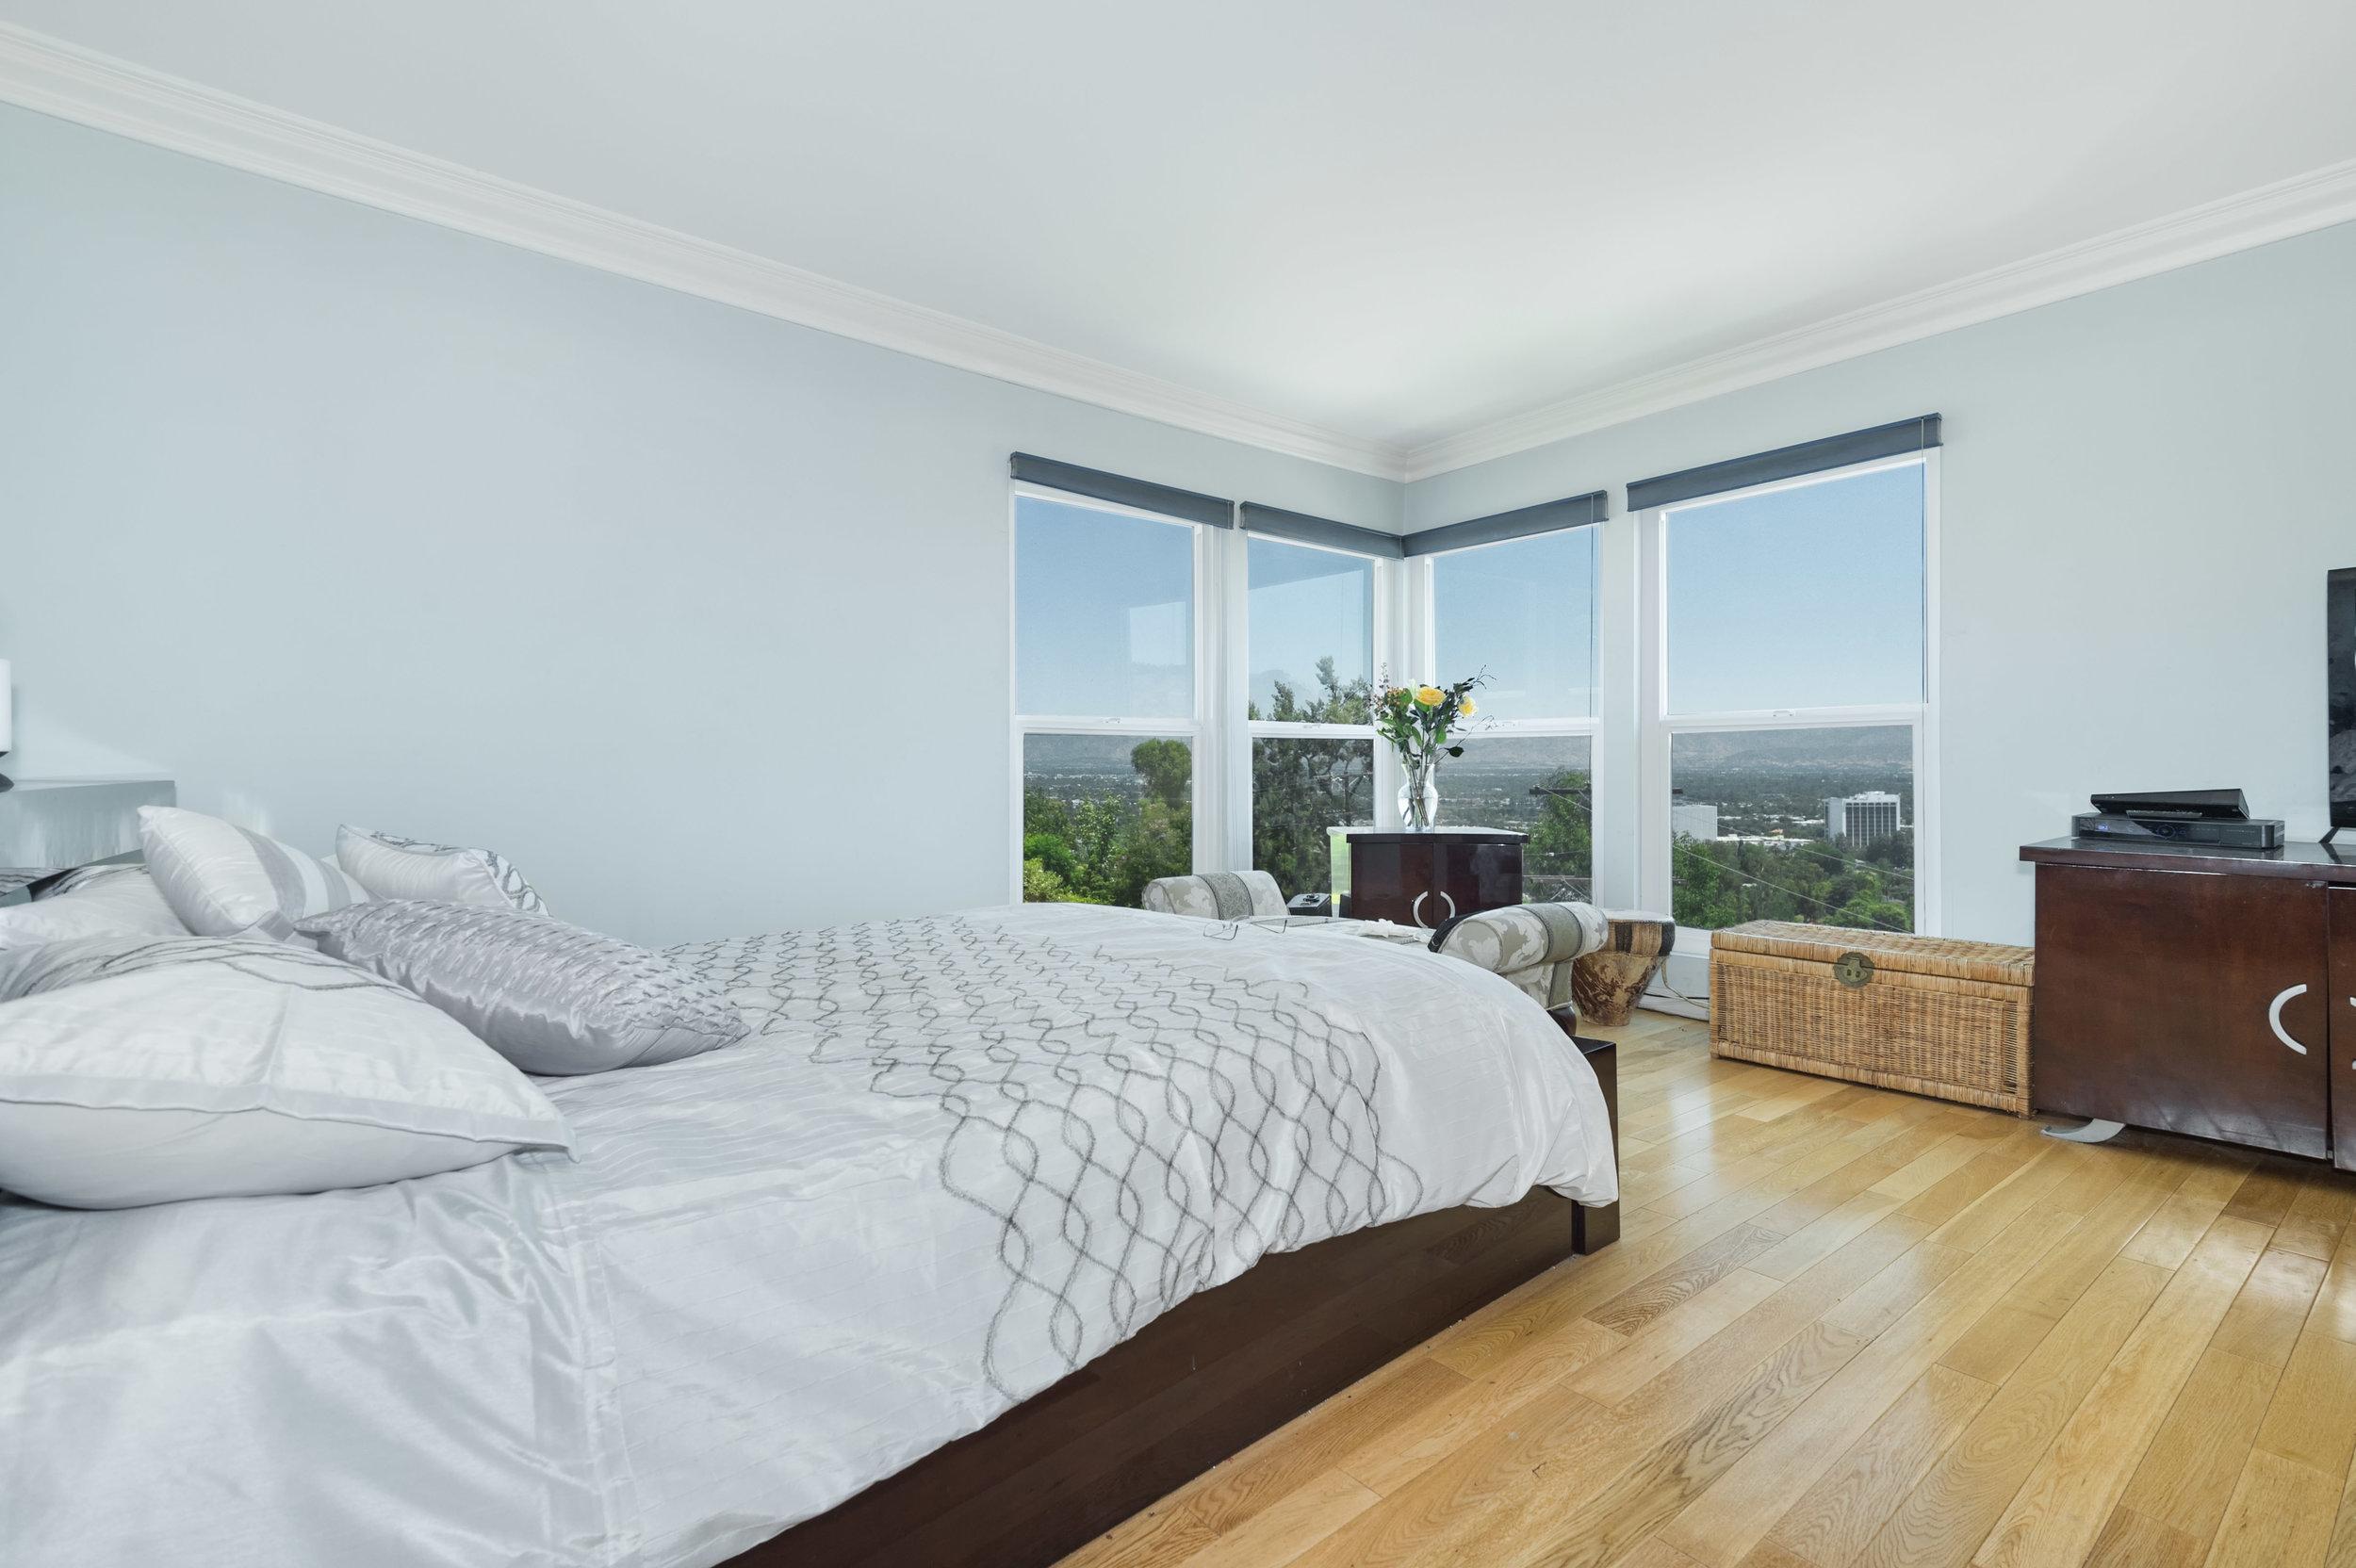 002 Master Bedroom 15072 Rayneta Sherman Oaks For Sale The Malibu Life Team Luxury Real Estate.jpg